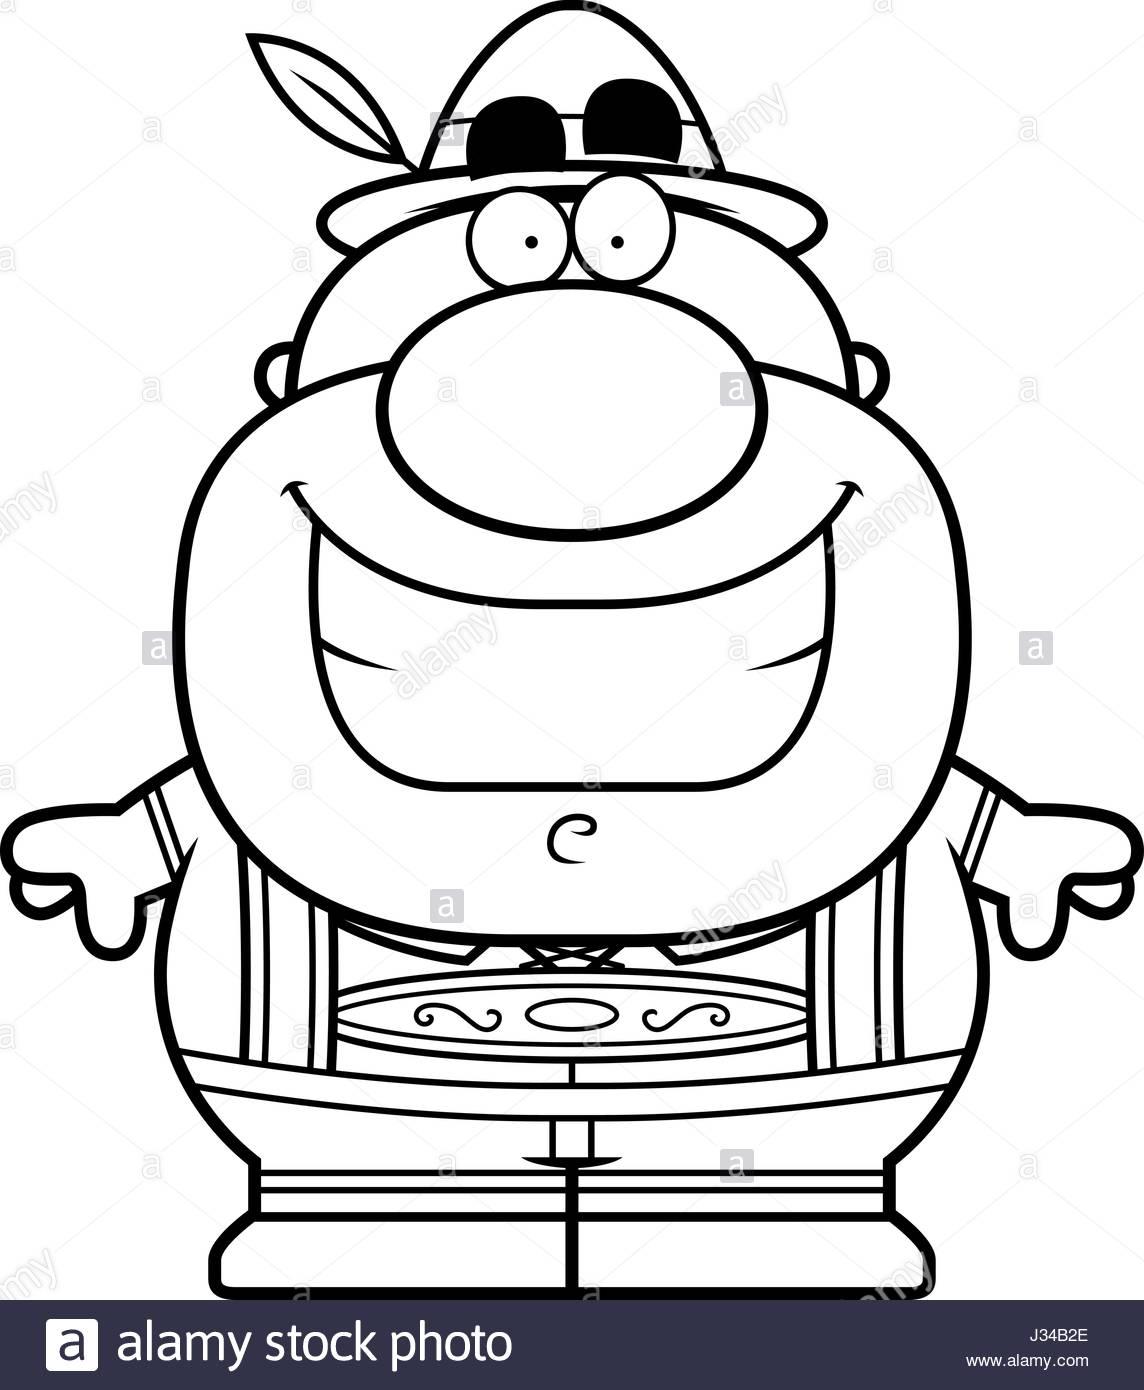 1144x1390 A Cartoon Illustration Of A German Man In Lederhosen Smiling Stock